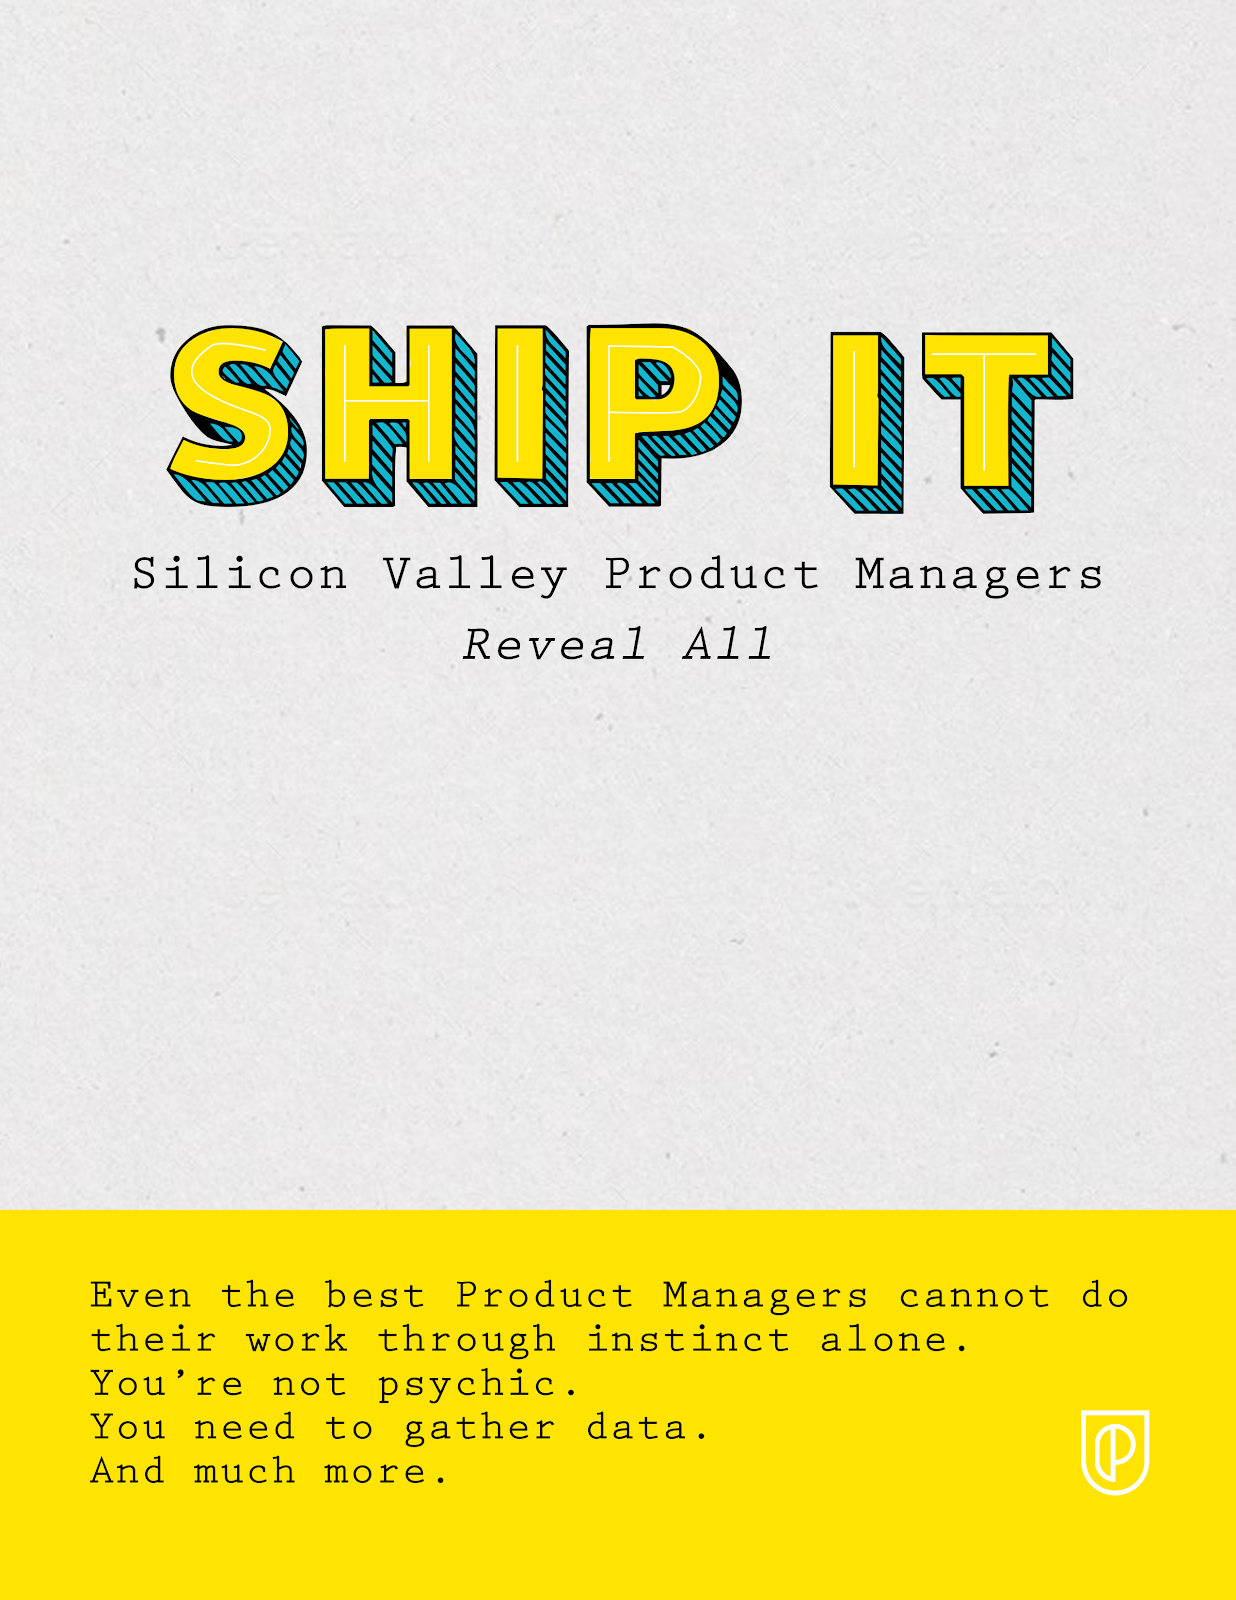 Business ebook #19: Ship It